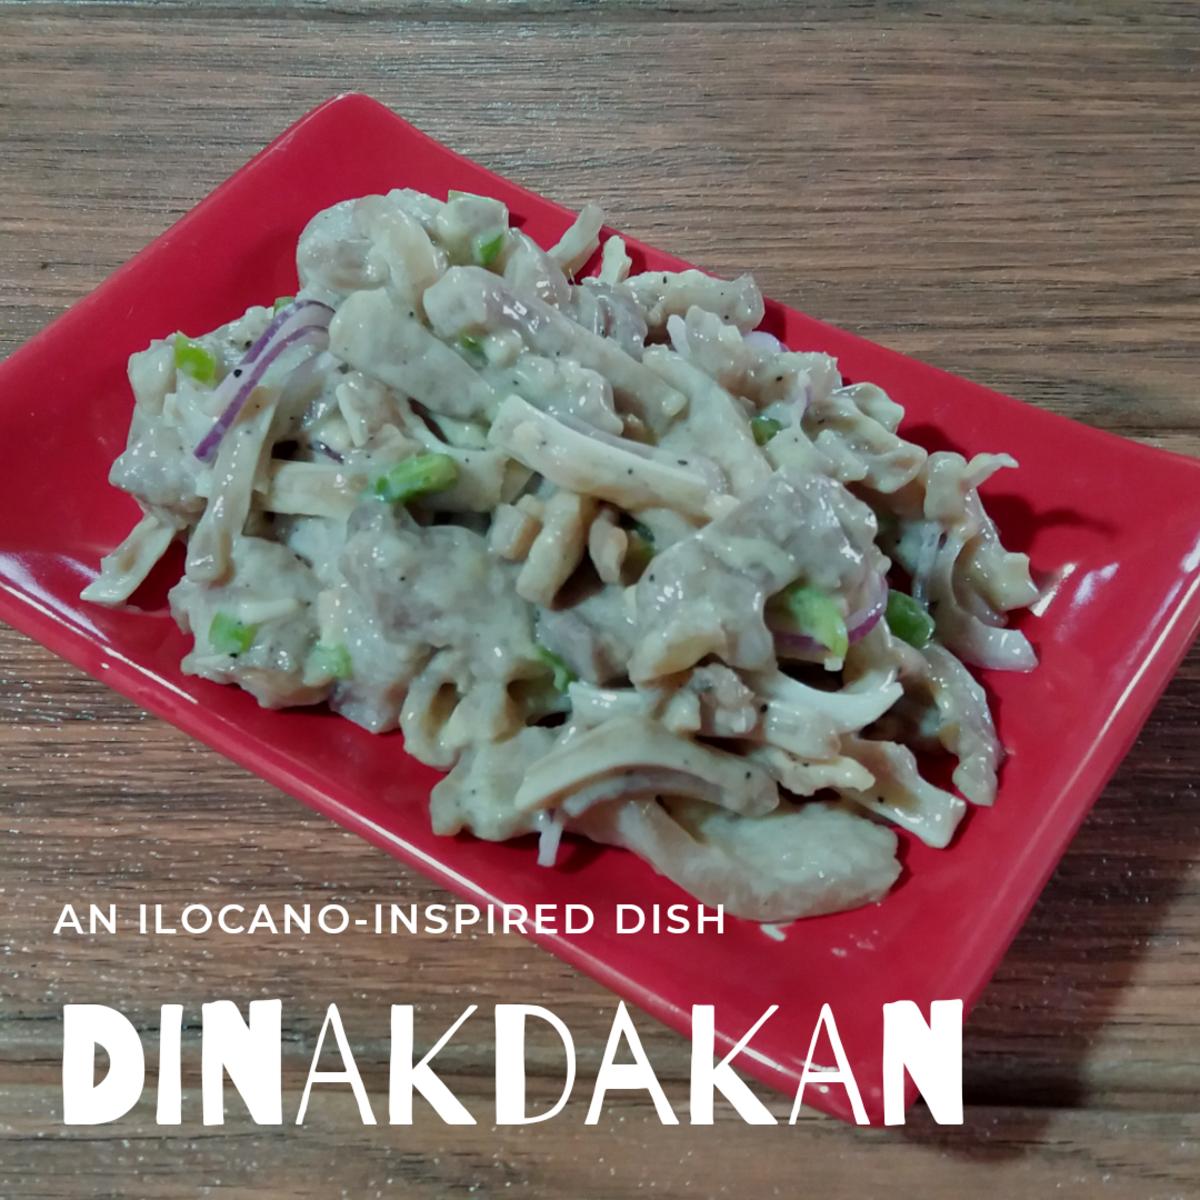 How to Cook Dinakdakan: An Ilocano Pulutan Dish